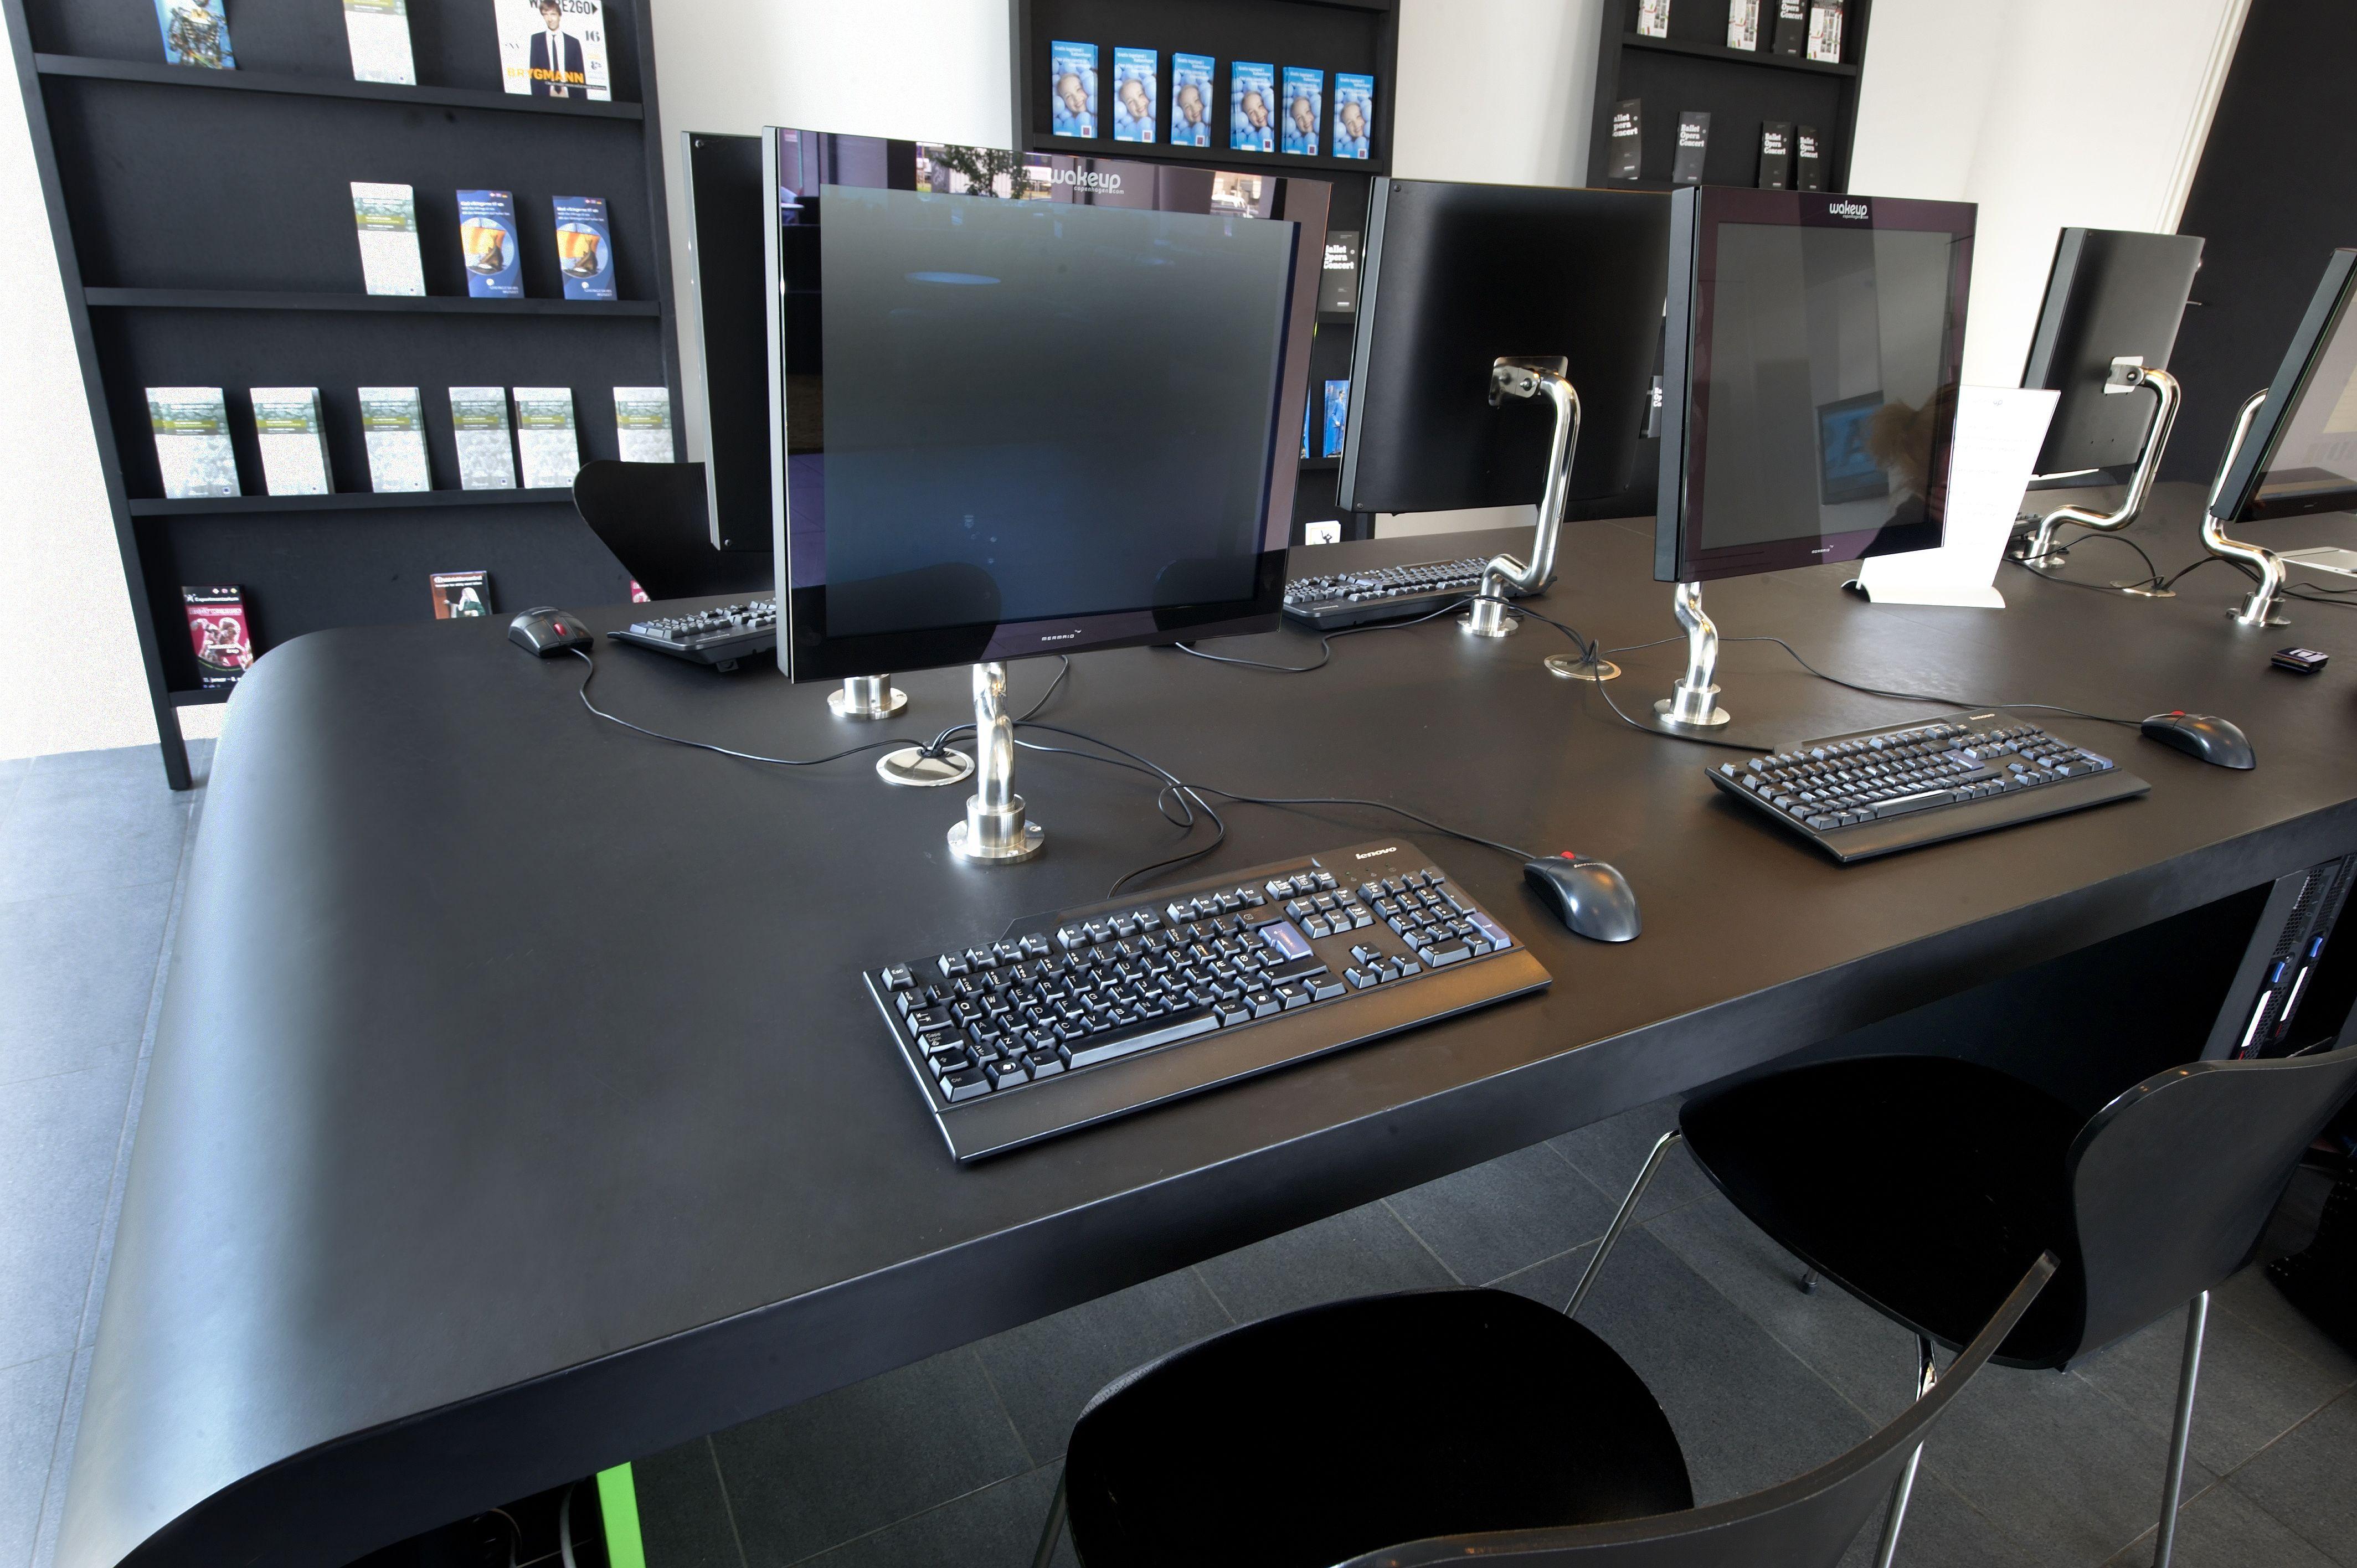 Desktop - Furniture Linoleum – Forbo – interior design - wakeup - interirgruppen - christianskov - desktop - sort